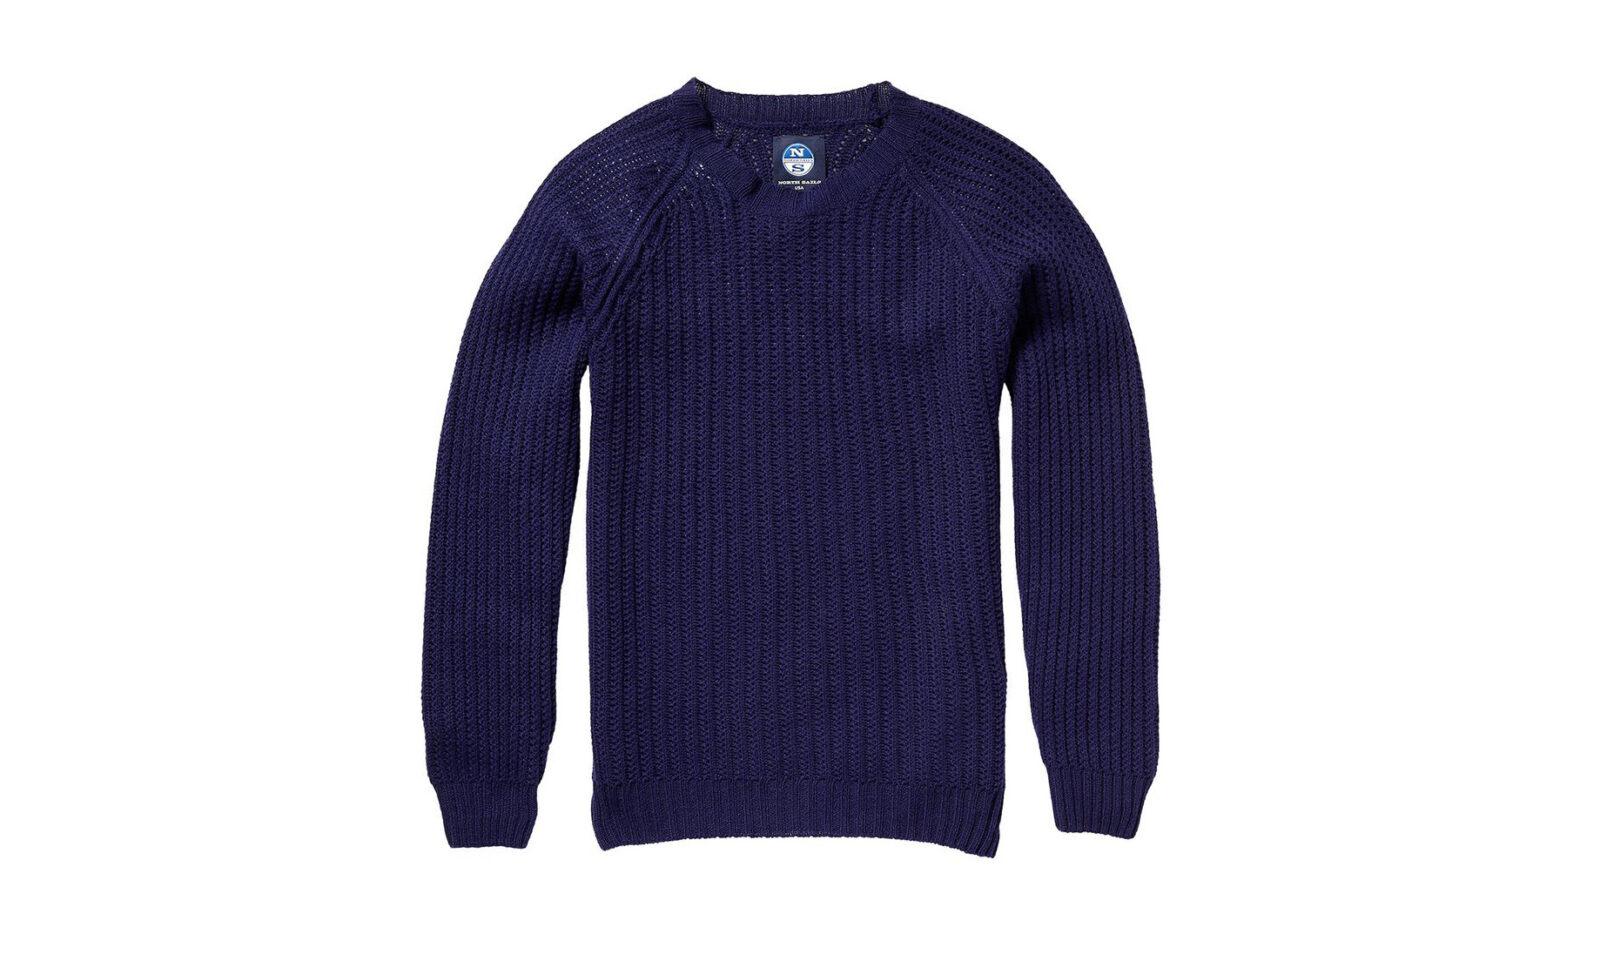 North Sails Hydro Wool Sweater 1 1600x954 - North Sails Hydro Wool Sweater